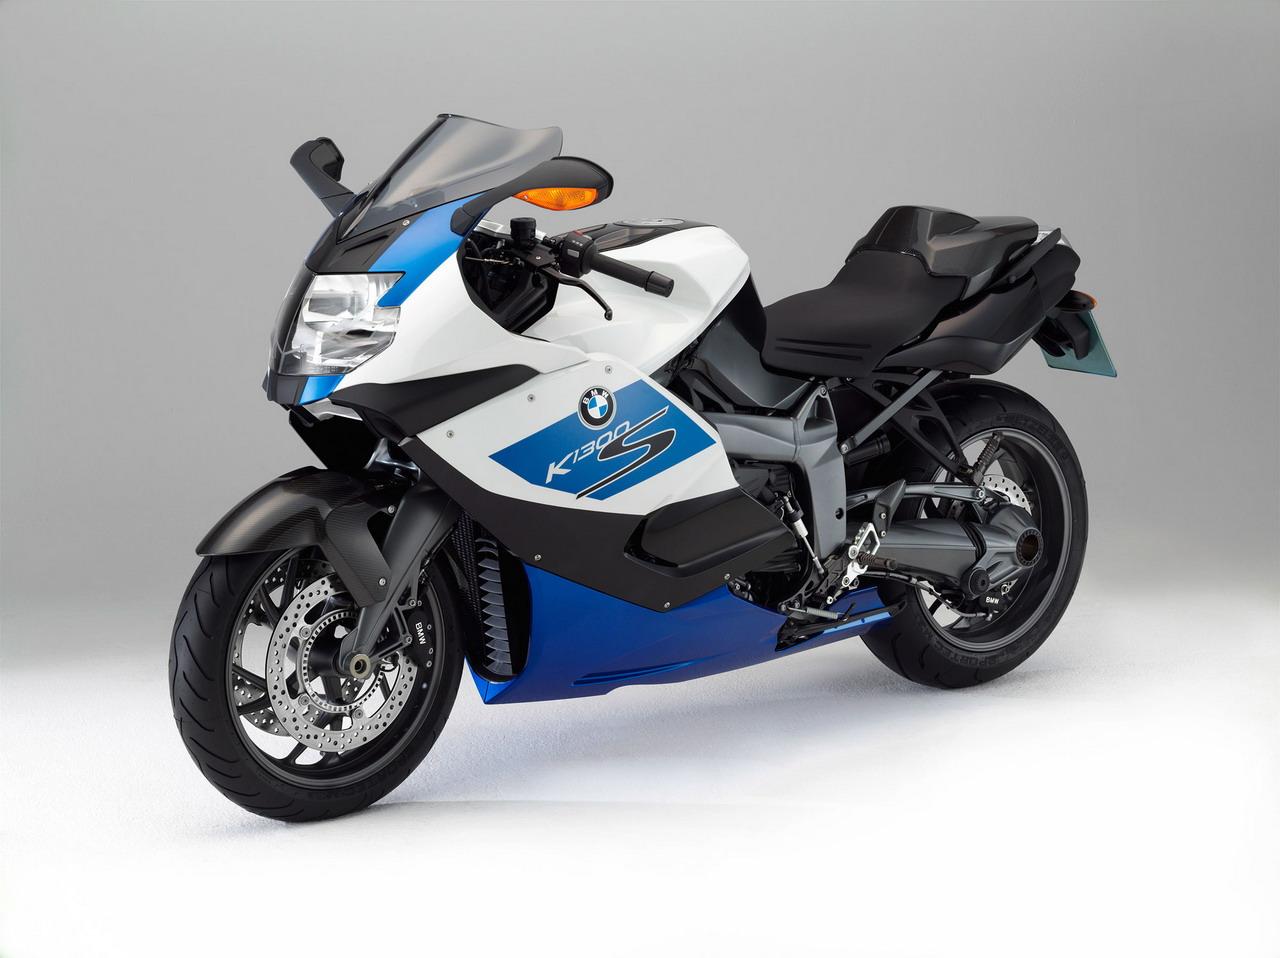 2012 bmw k1300s hp new motorcycle. Black Bedroom Furniture Sets. Home Design Ideas